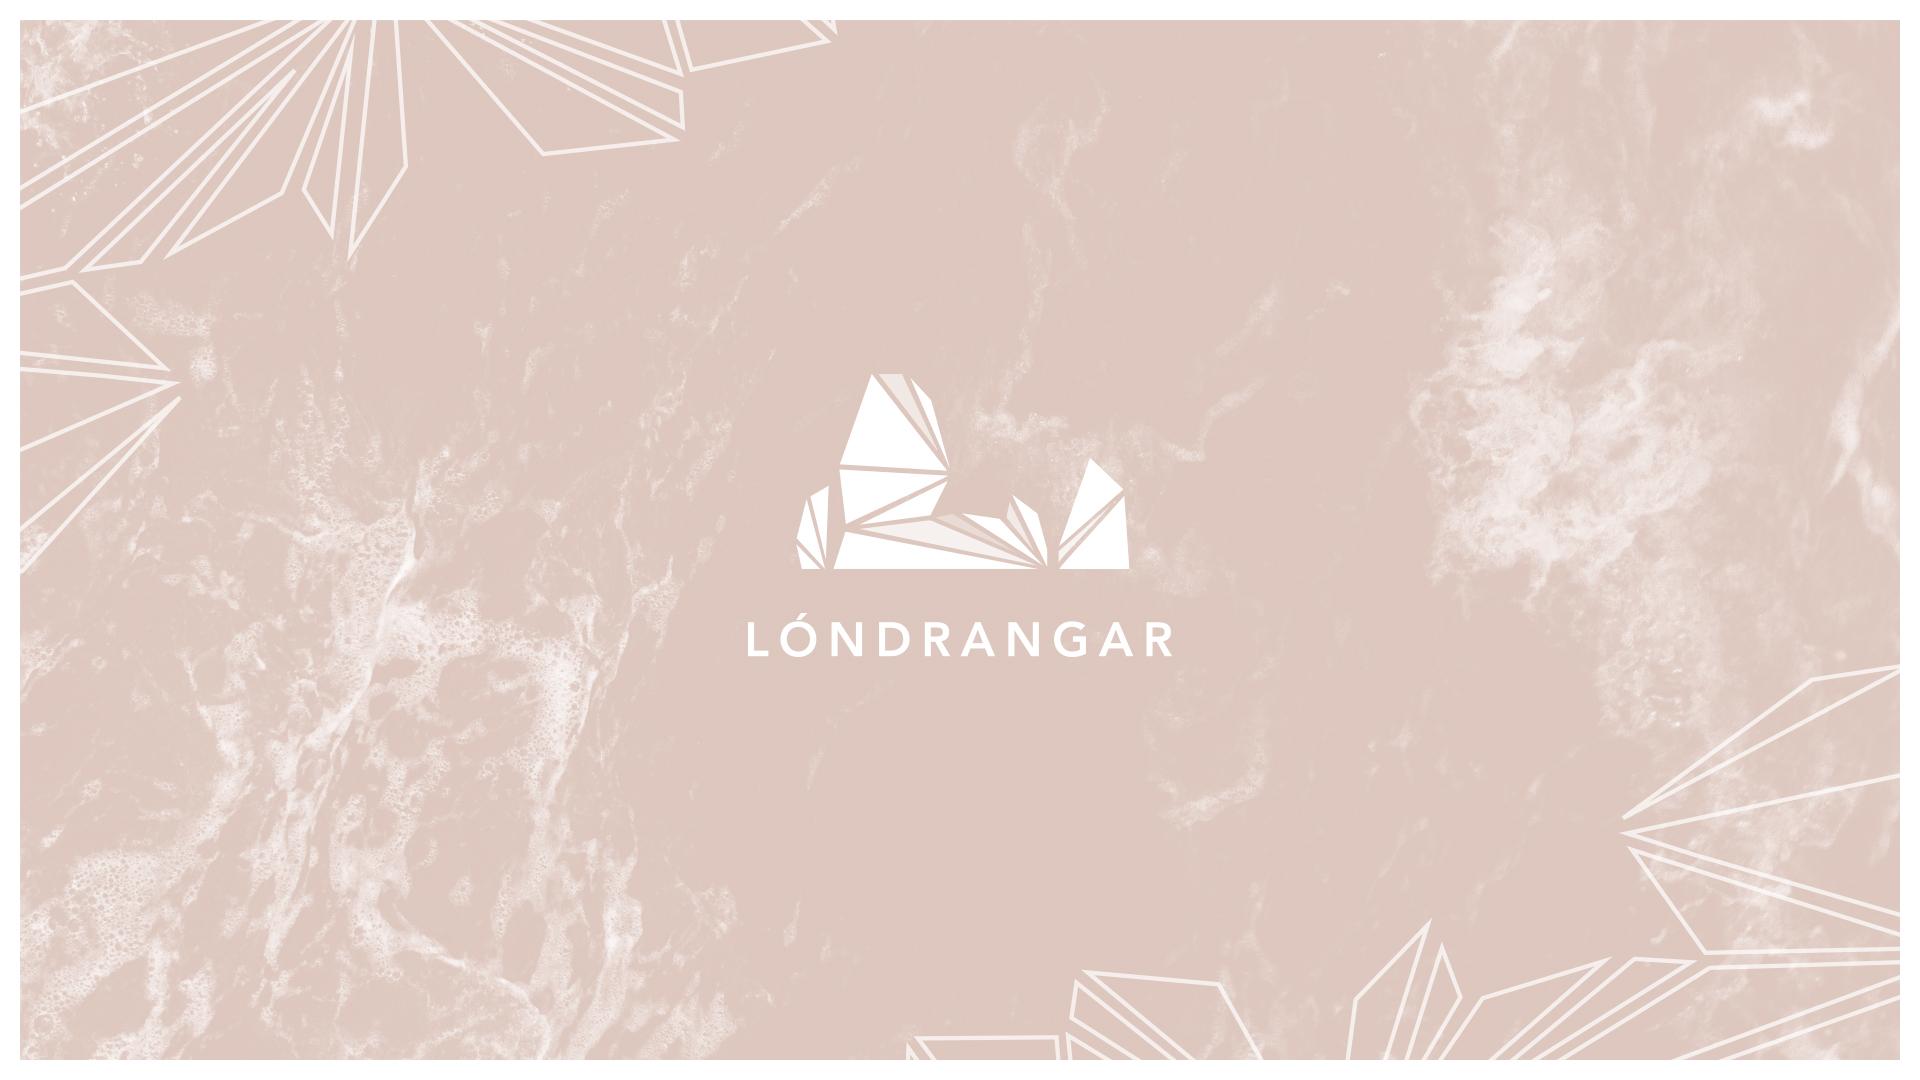 londrangar_cover3